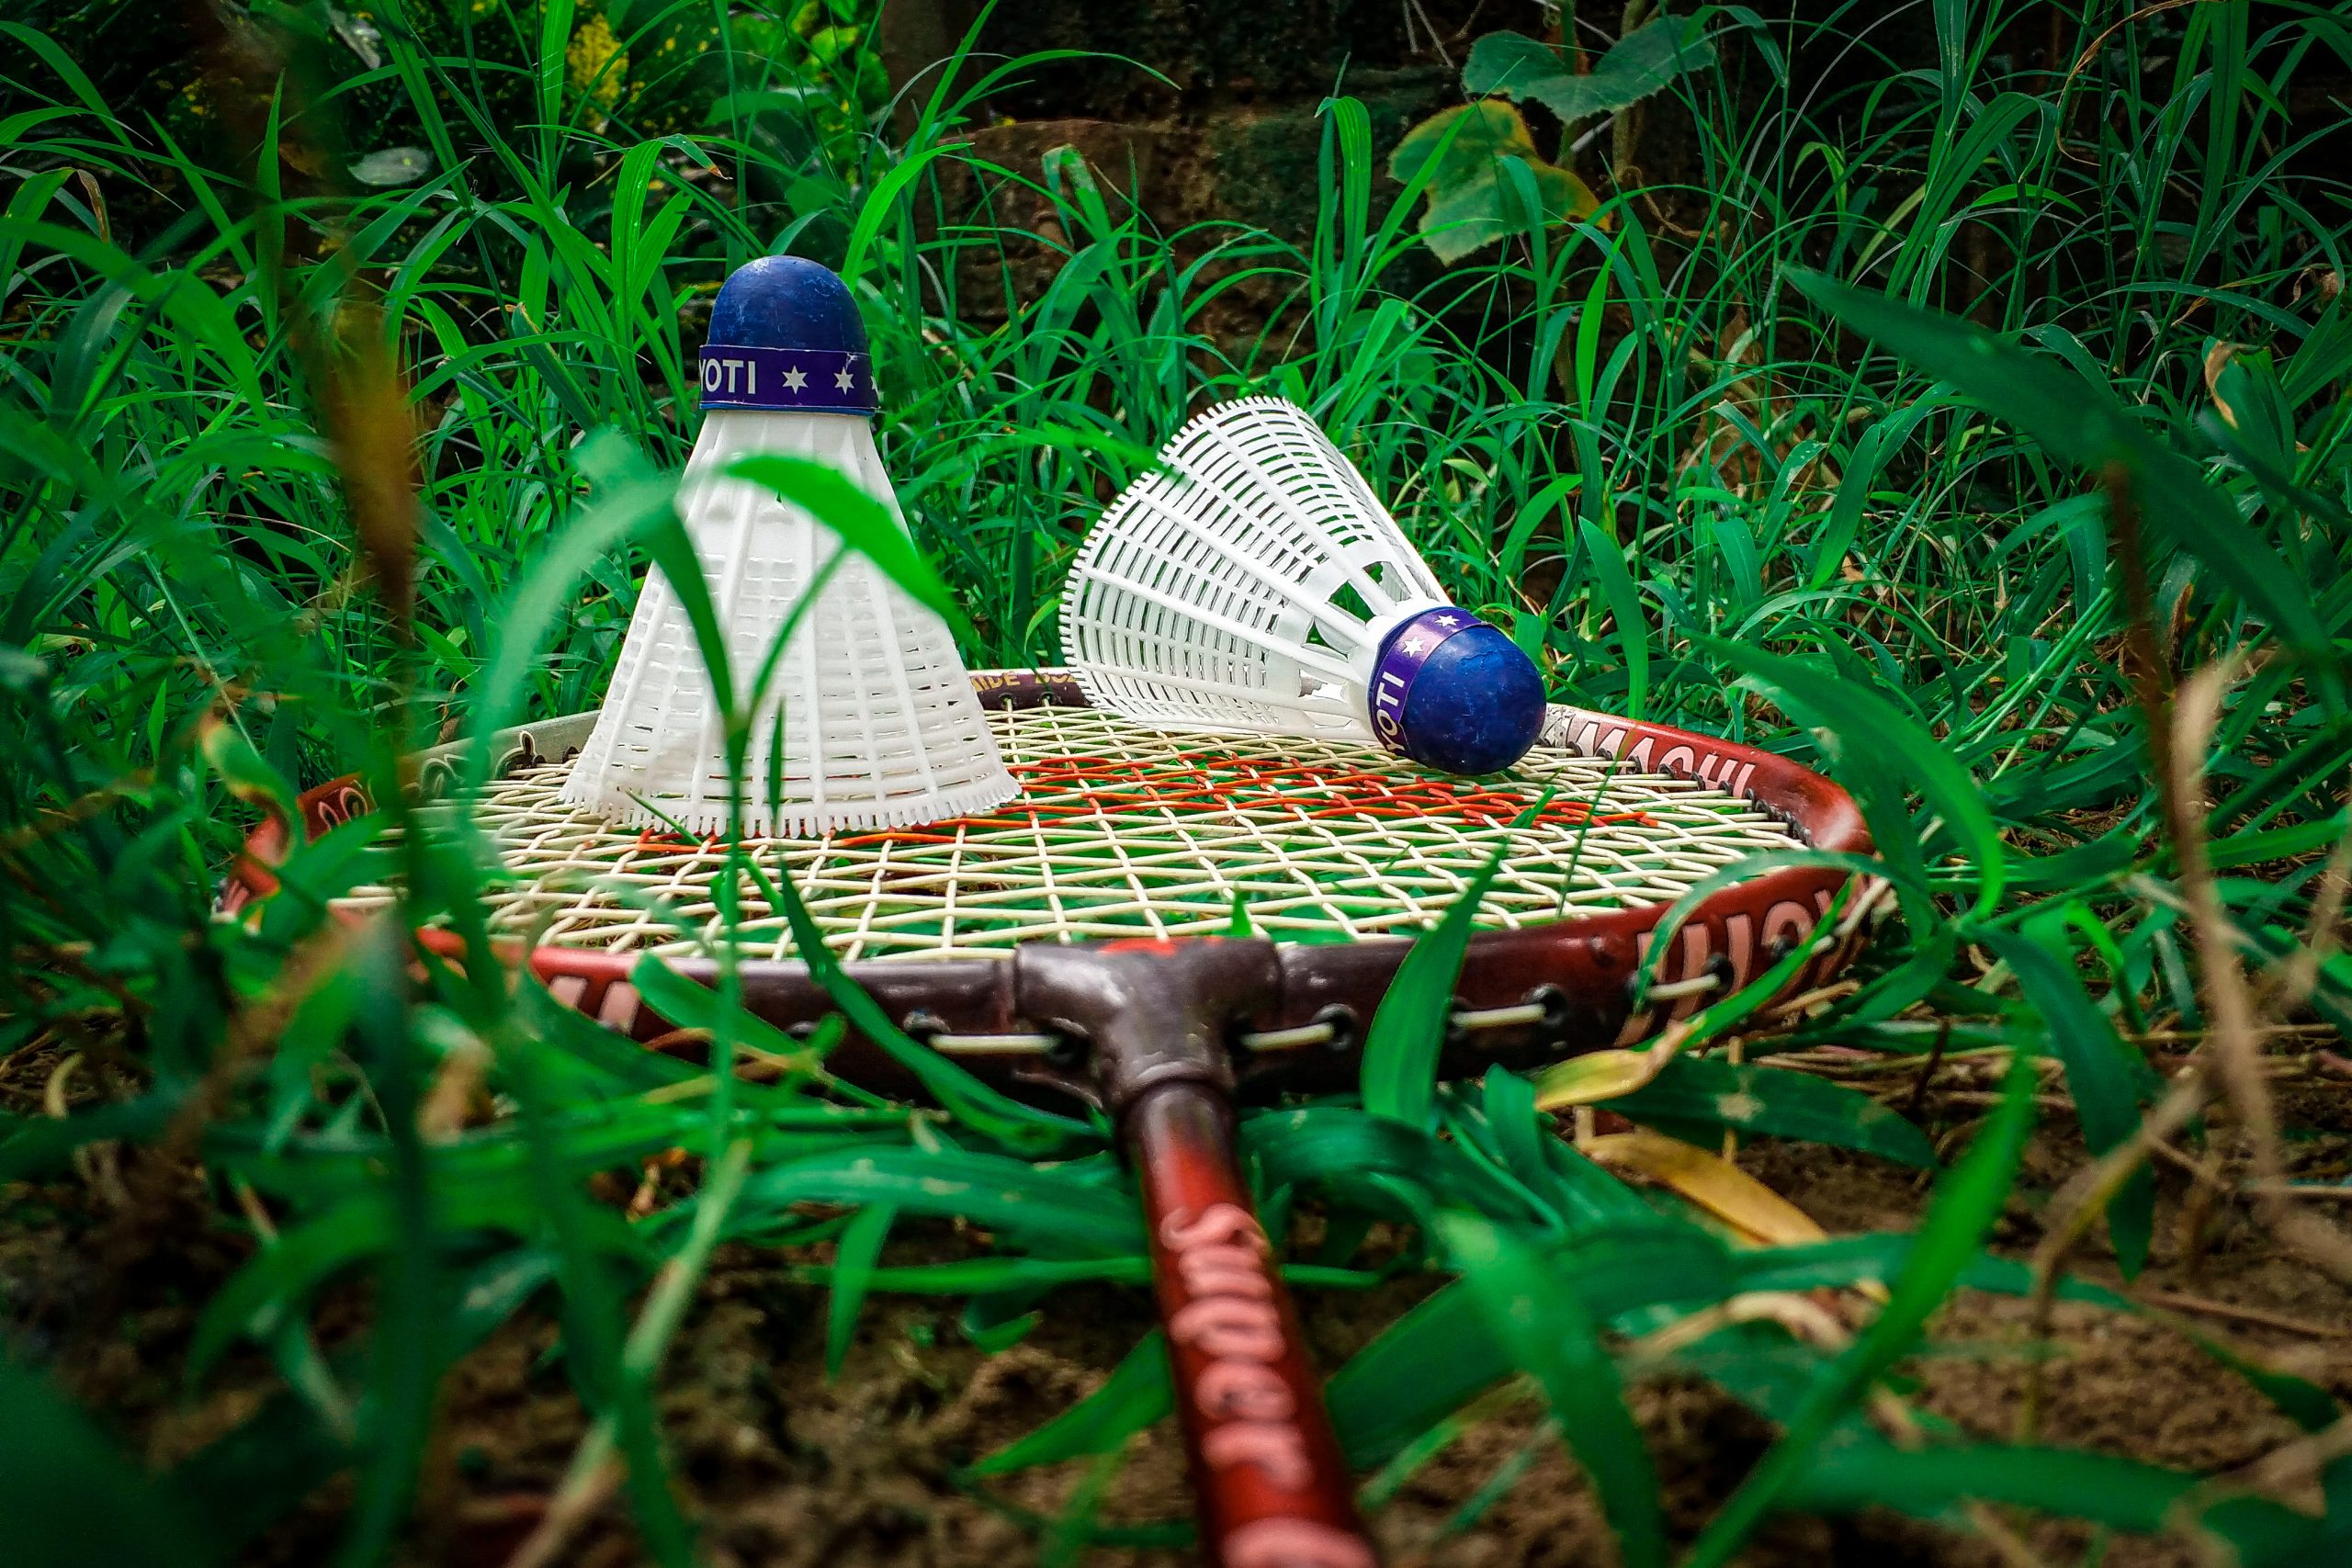 badminton with shuttlecock